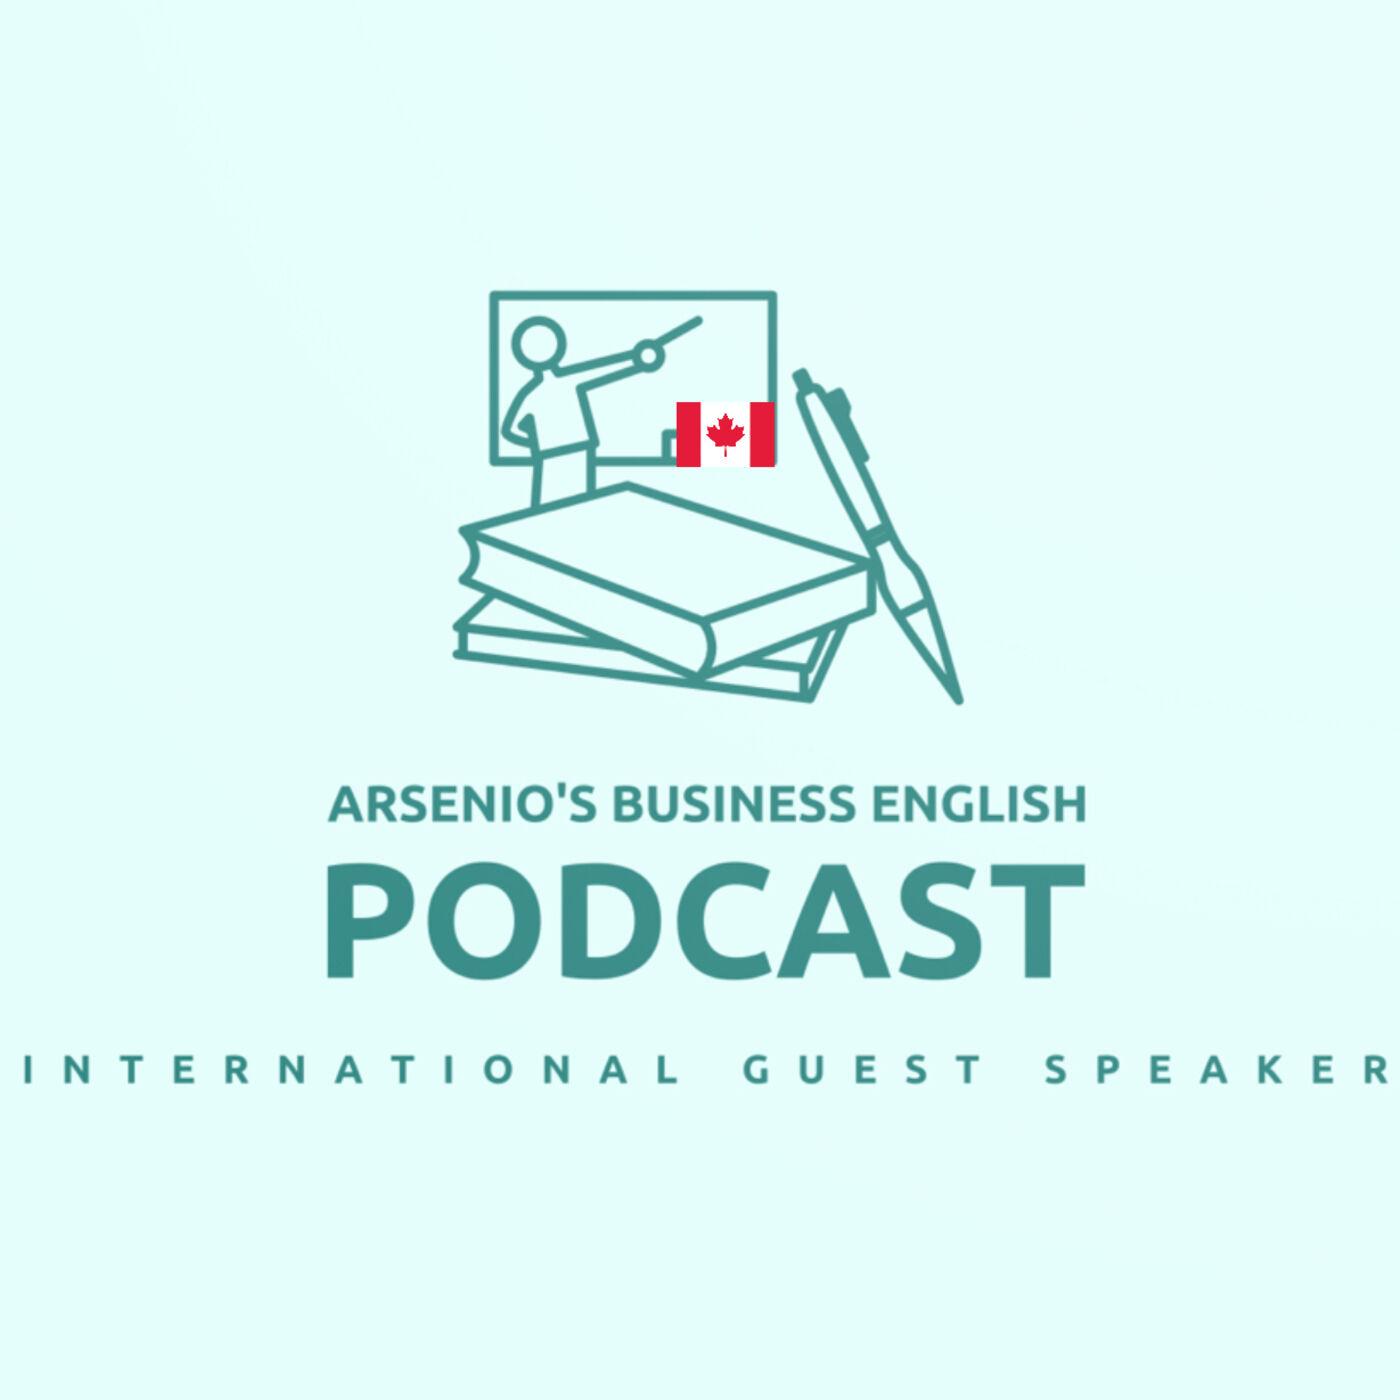 International Business Guest Speaker | Crystal of Canada | How to Choose an ESL Teacher/Tutor